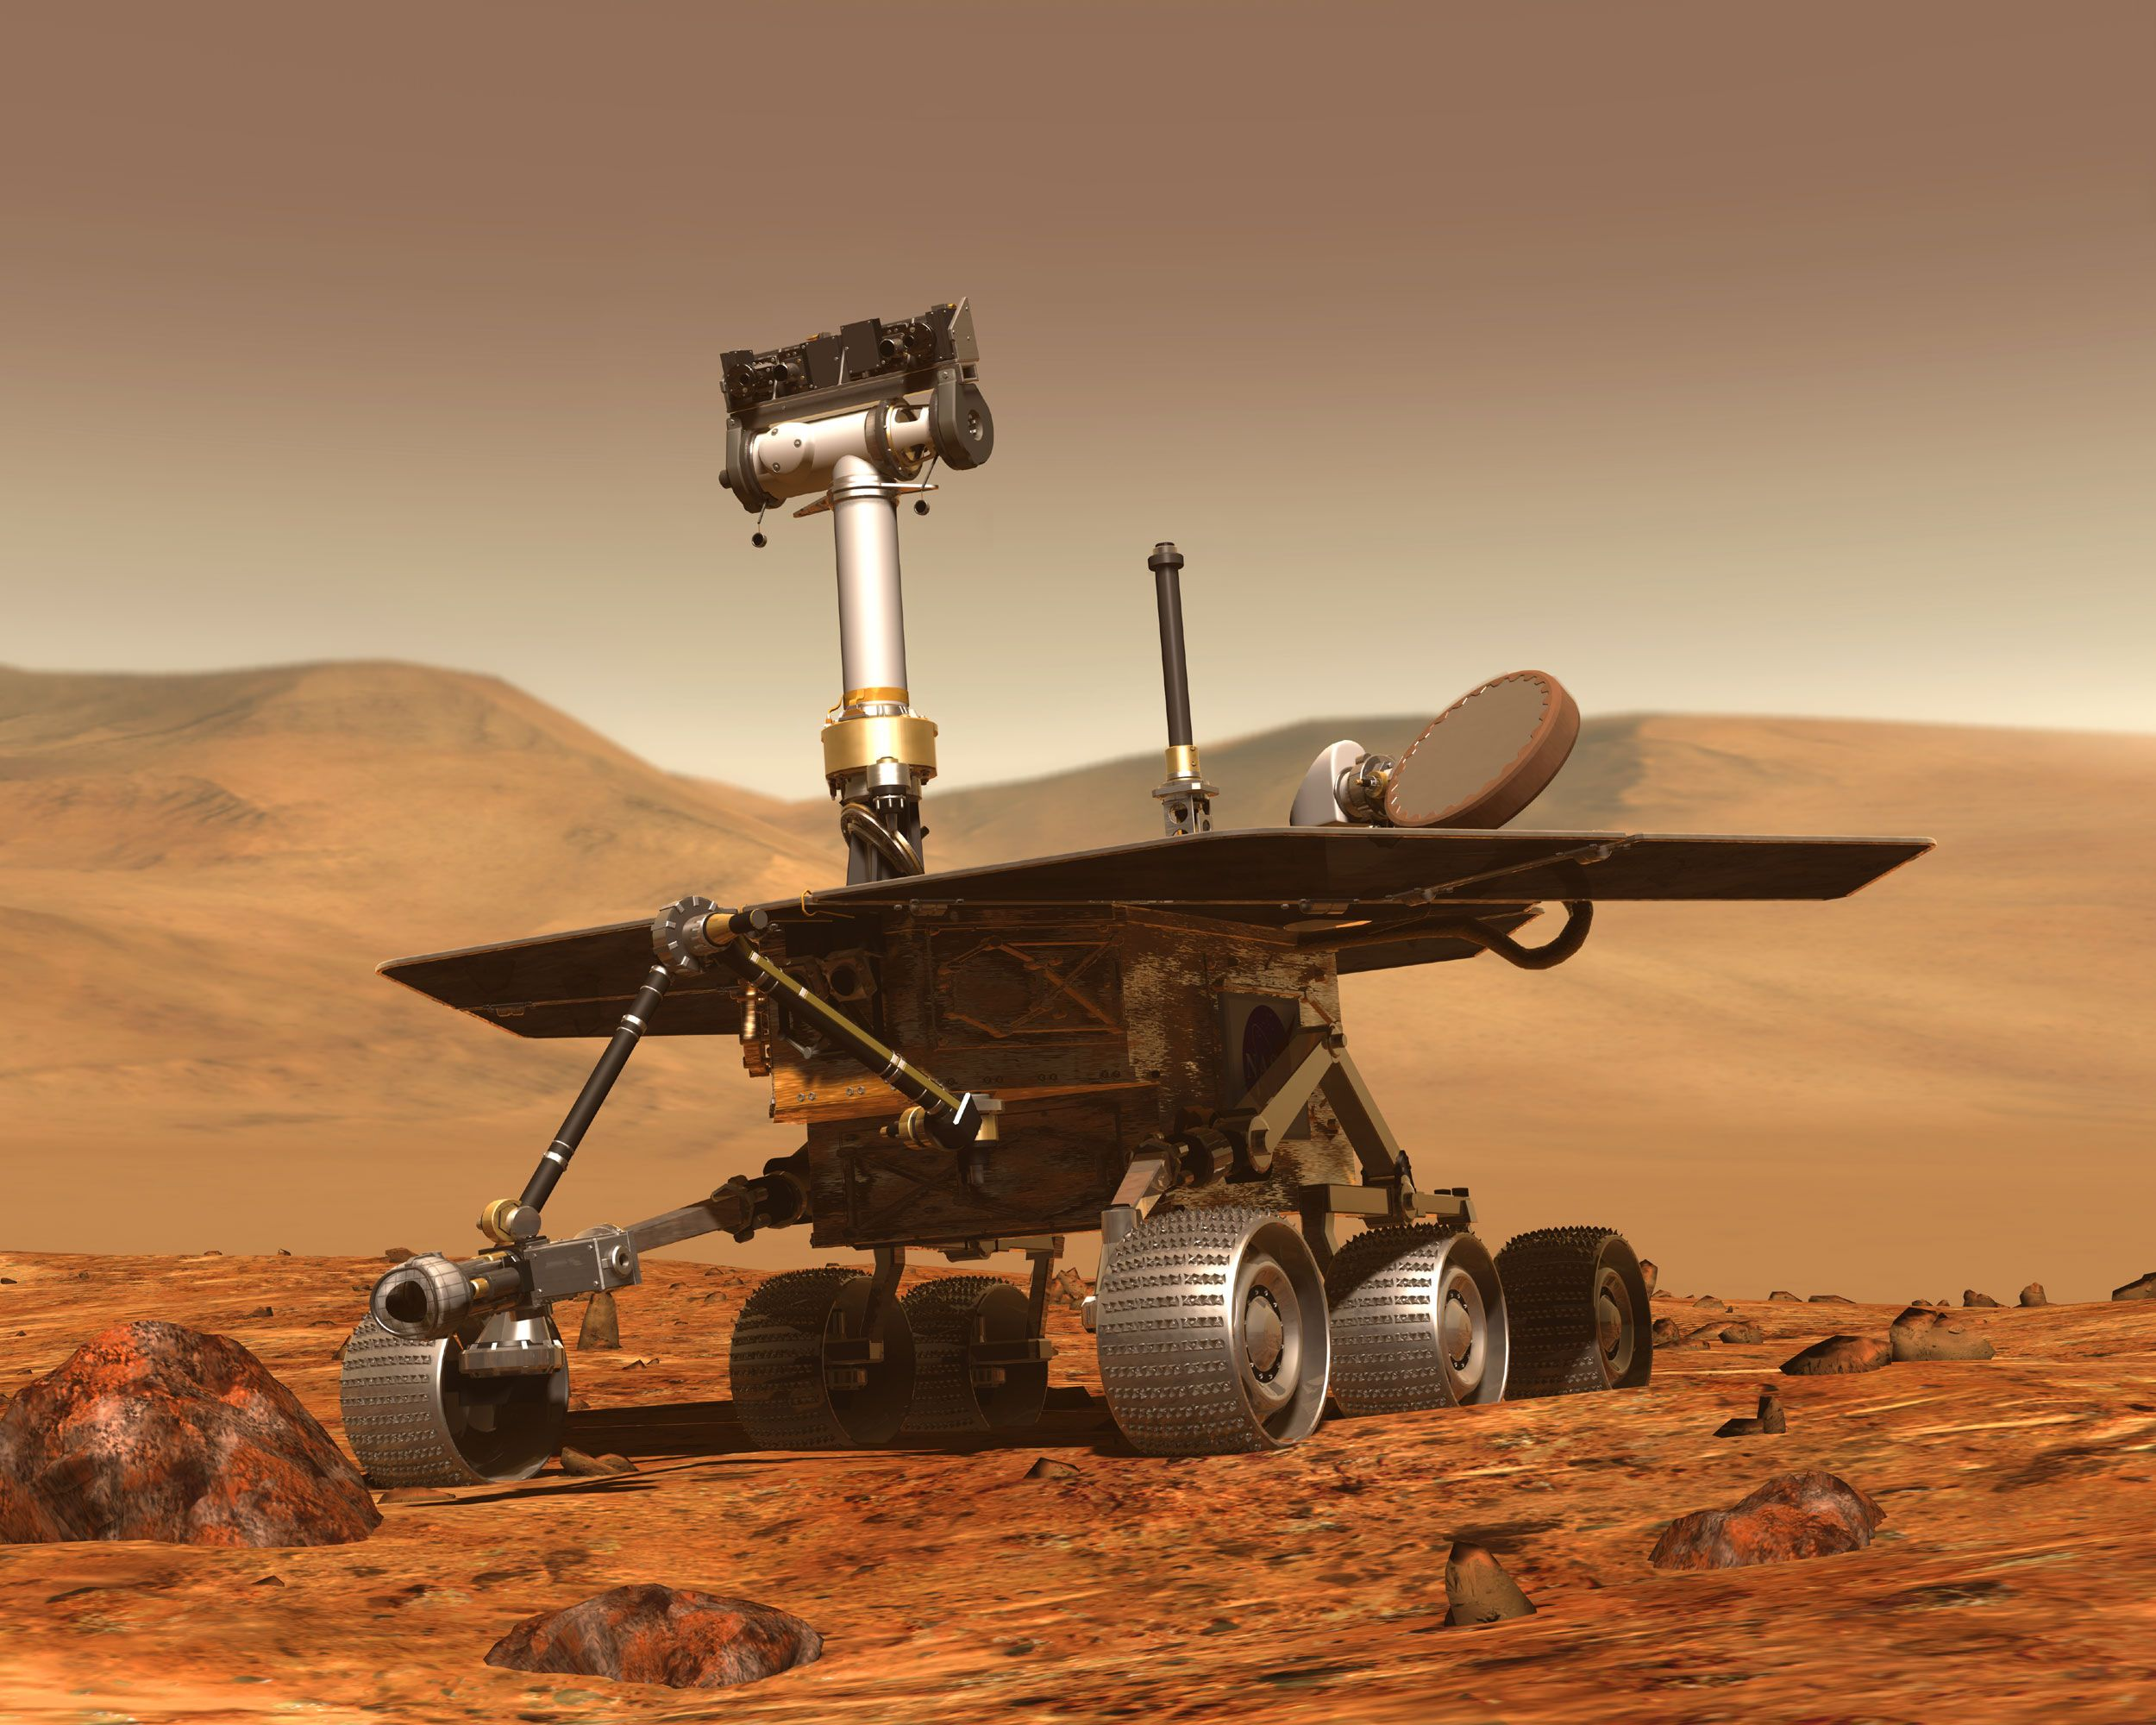 Камеры марсохода нашли странные структуры